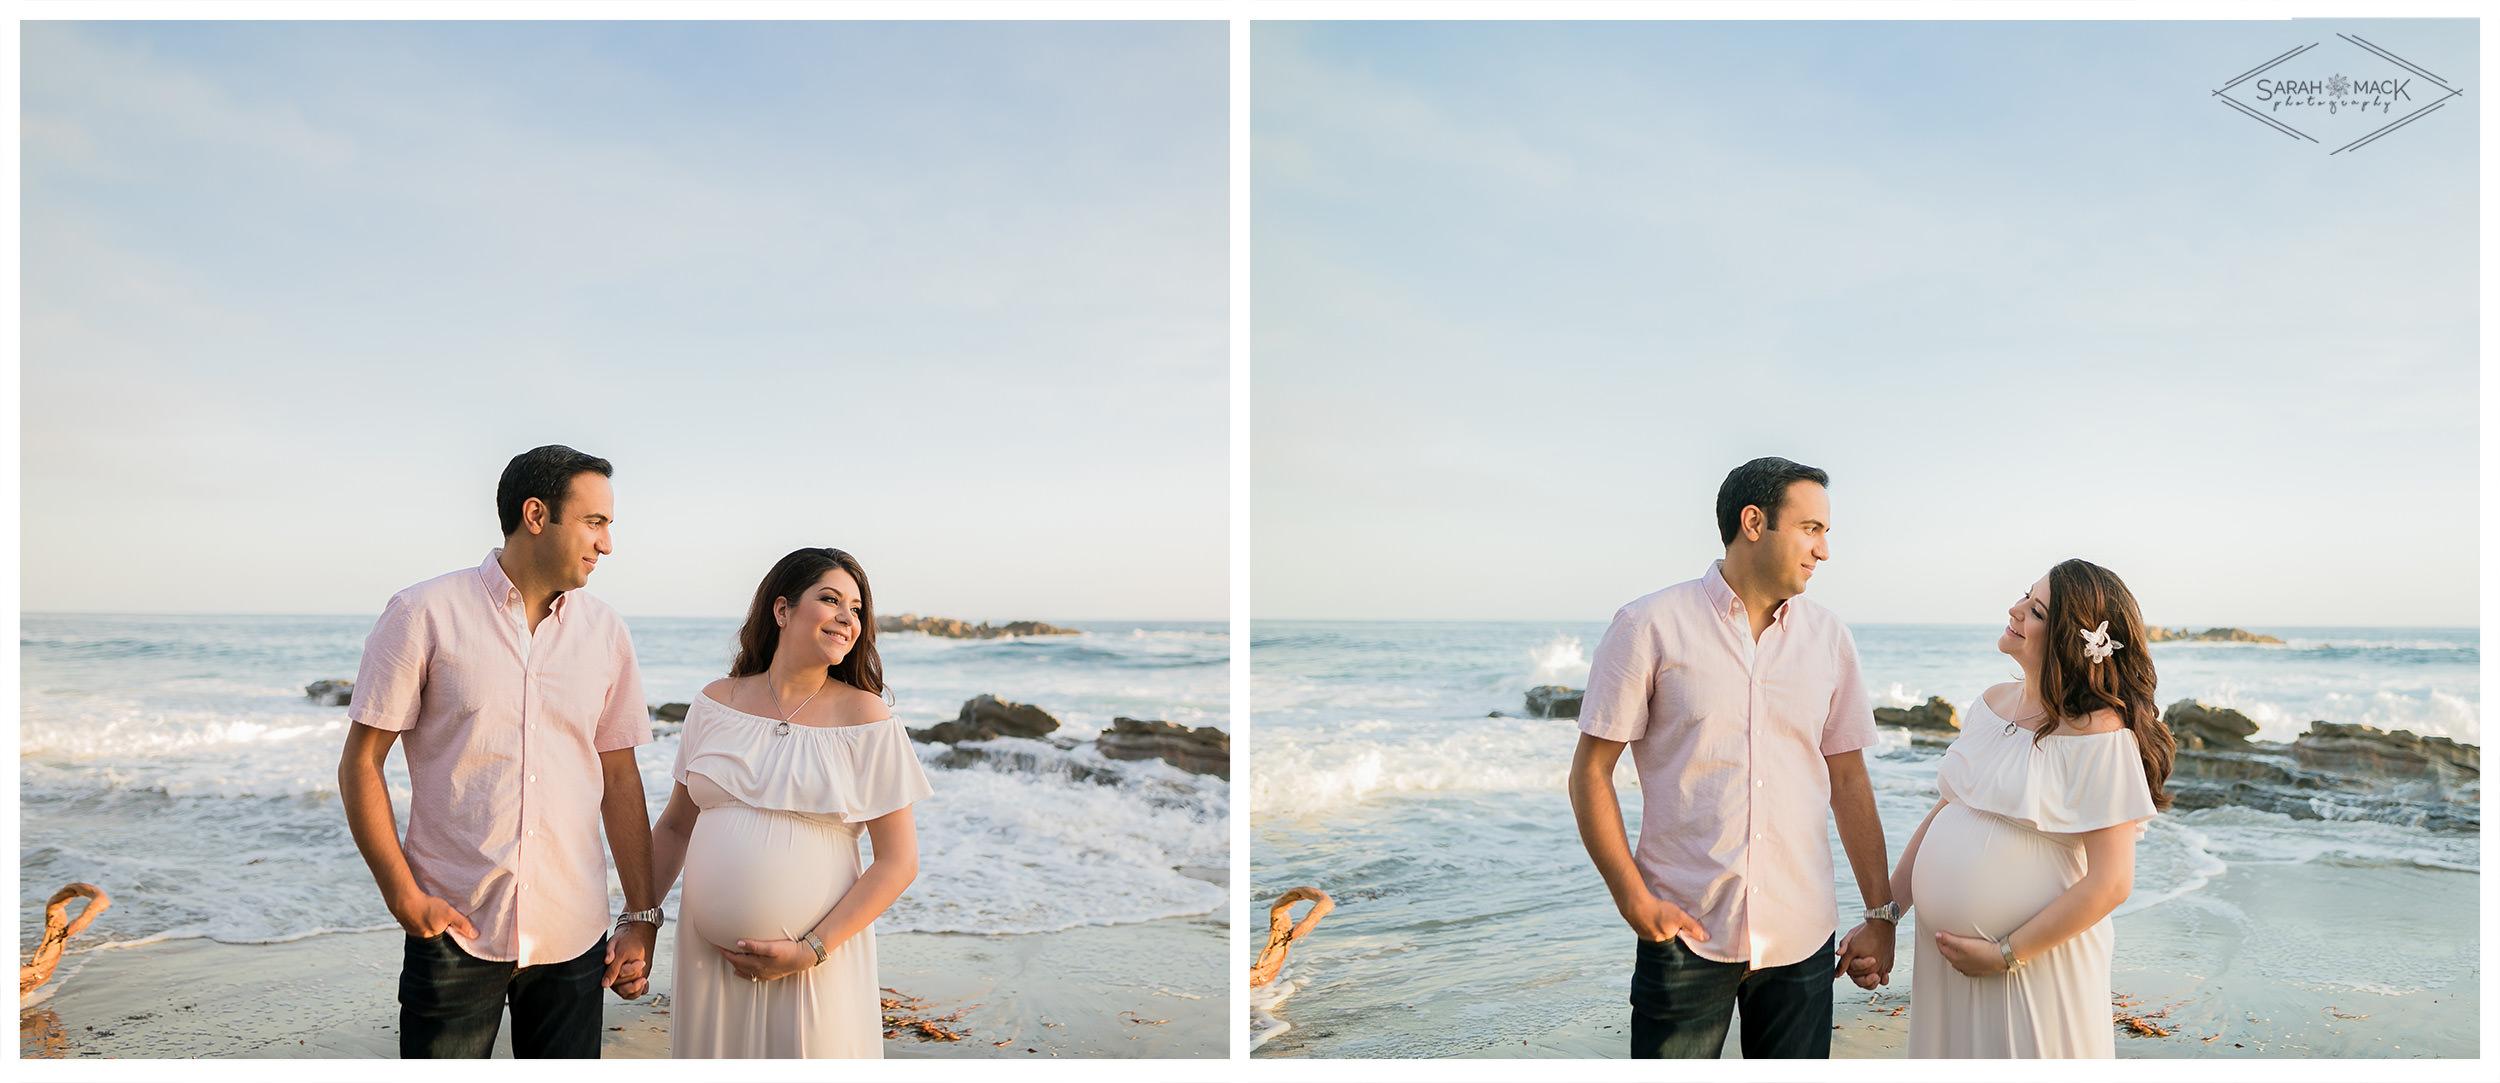 MA-Orange-County-Maternity-Photography-4.jpg